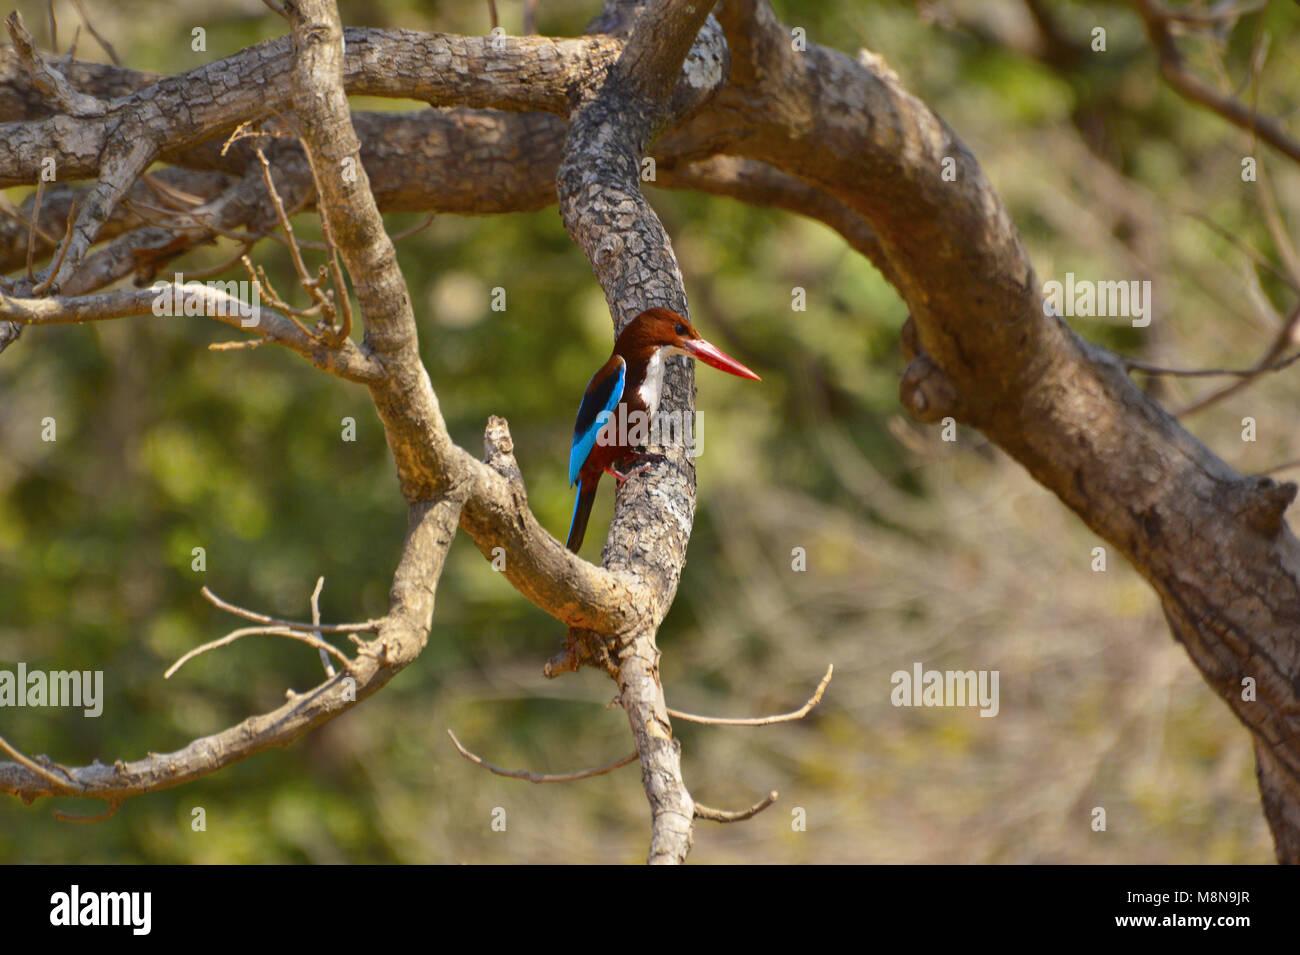 White-throated Kingfisher, Halcyon smyrnensis on a branch at Sagareshwar wildlife sanctuary, Sangli, Maharashtra, - Stock Image